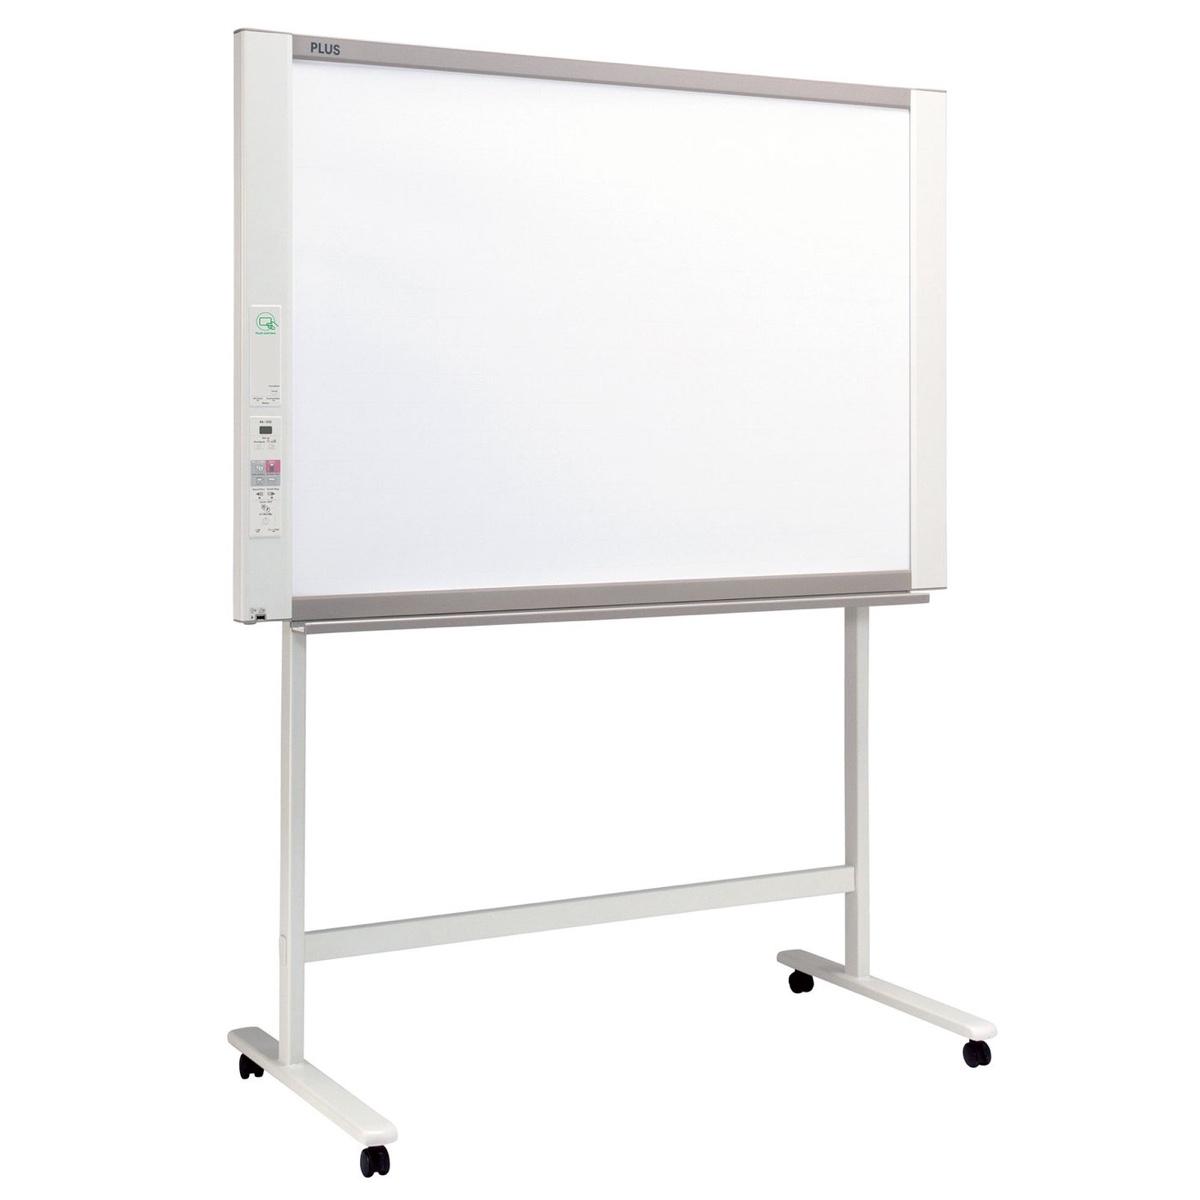 PLUS Whiteboards:  The PLUS Copyboard N-32S